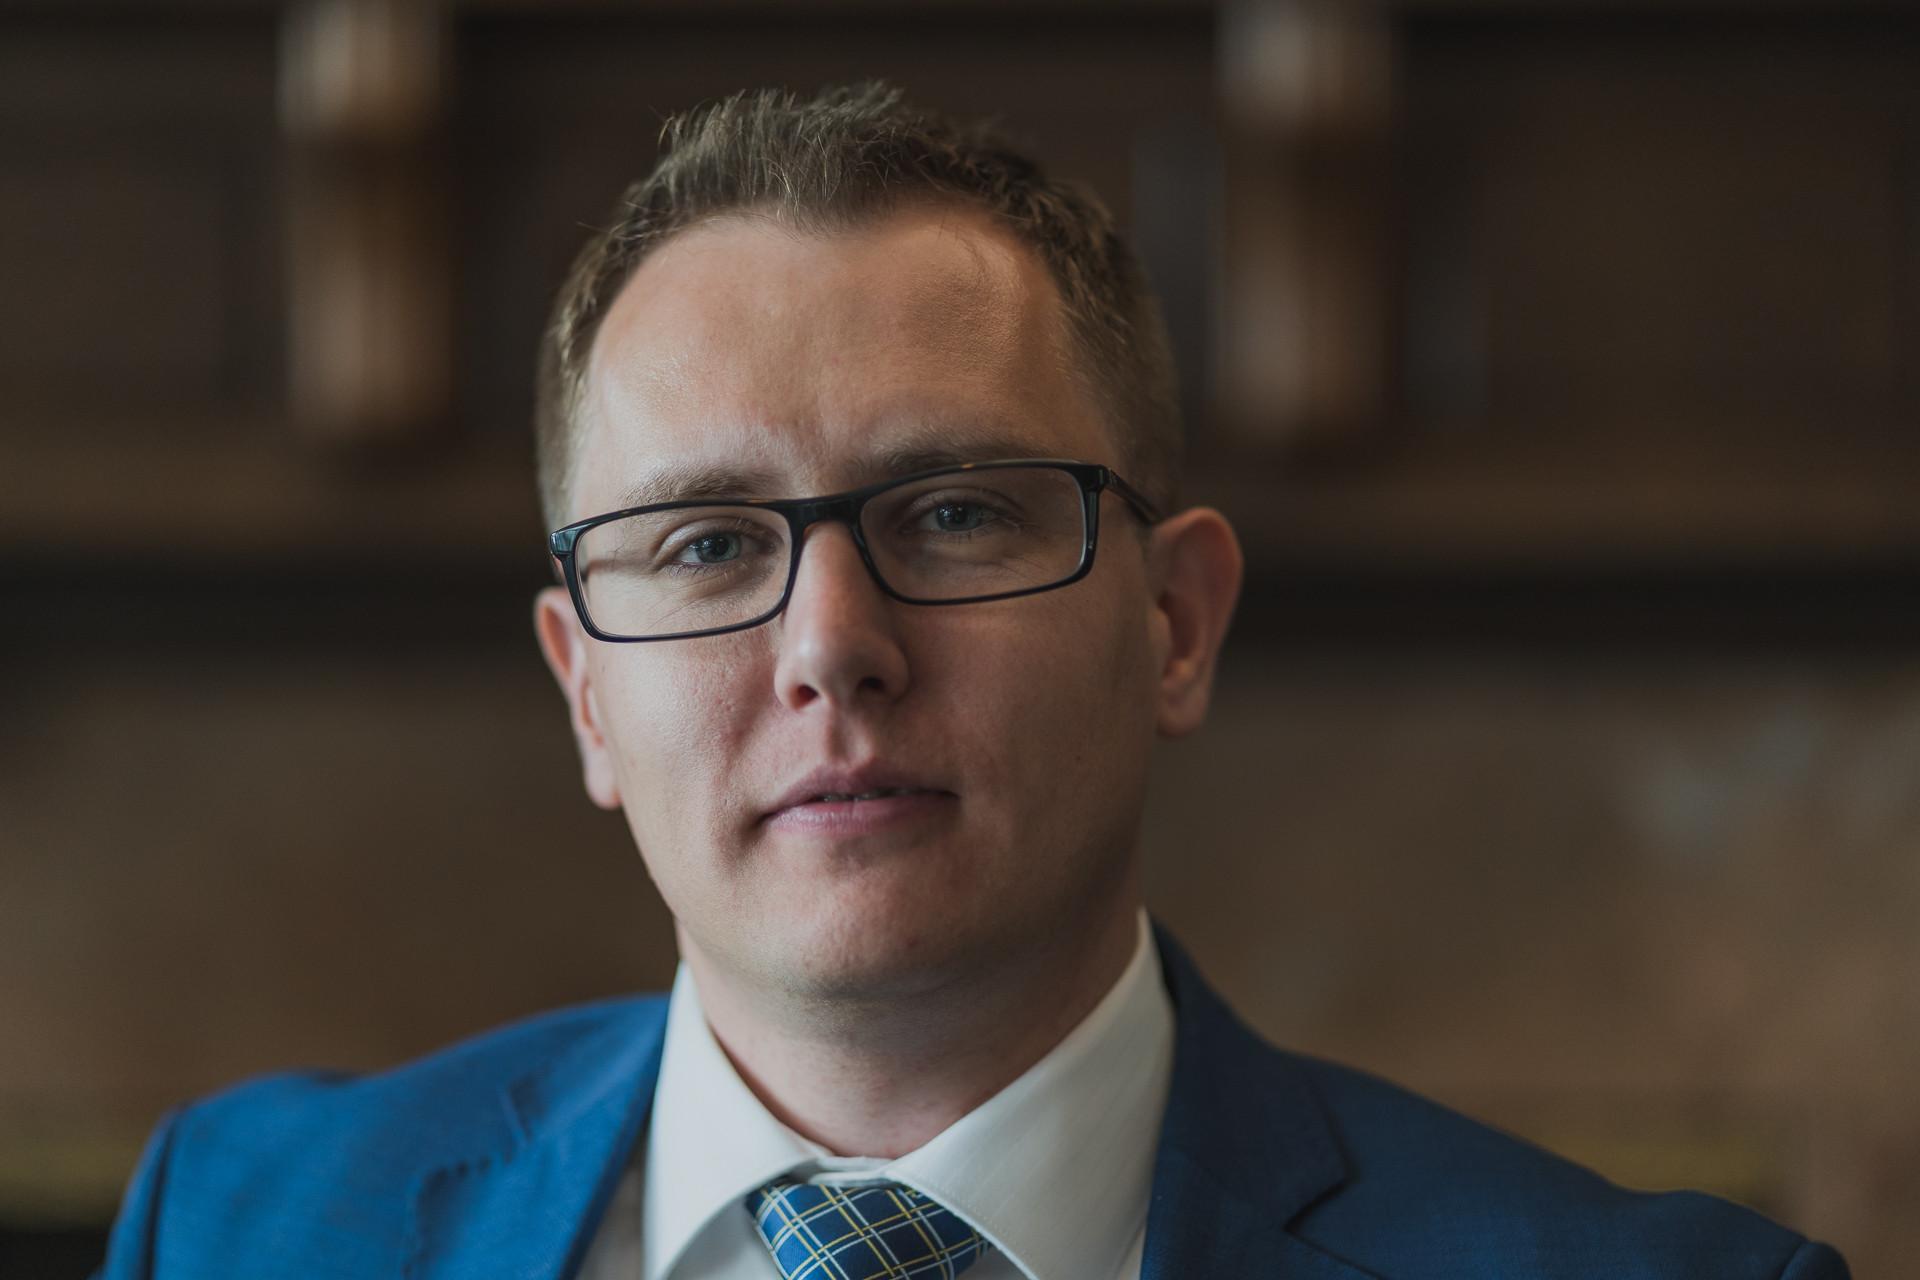 Corporate Headshot for Konstantin Kuligin